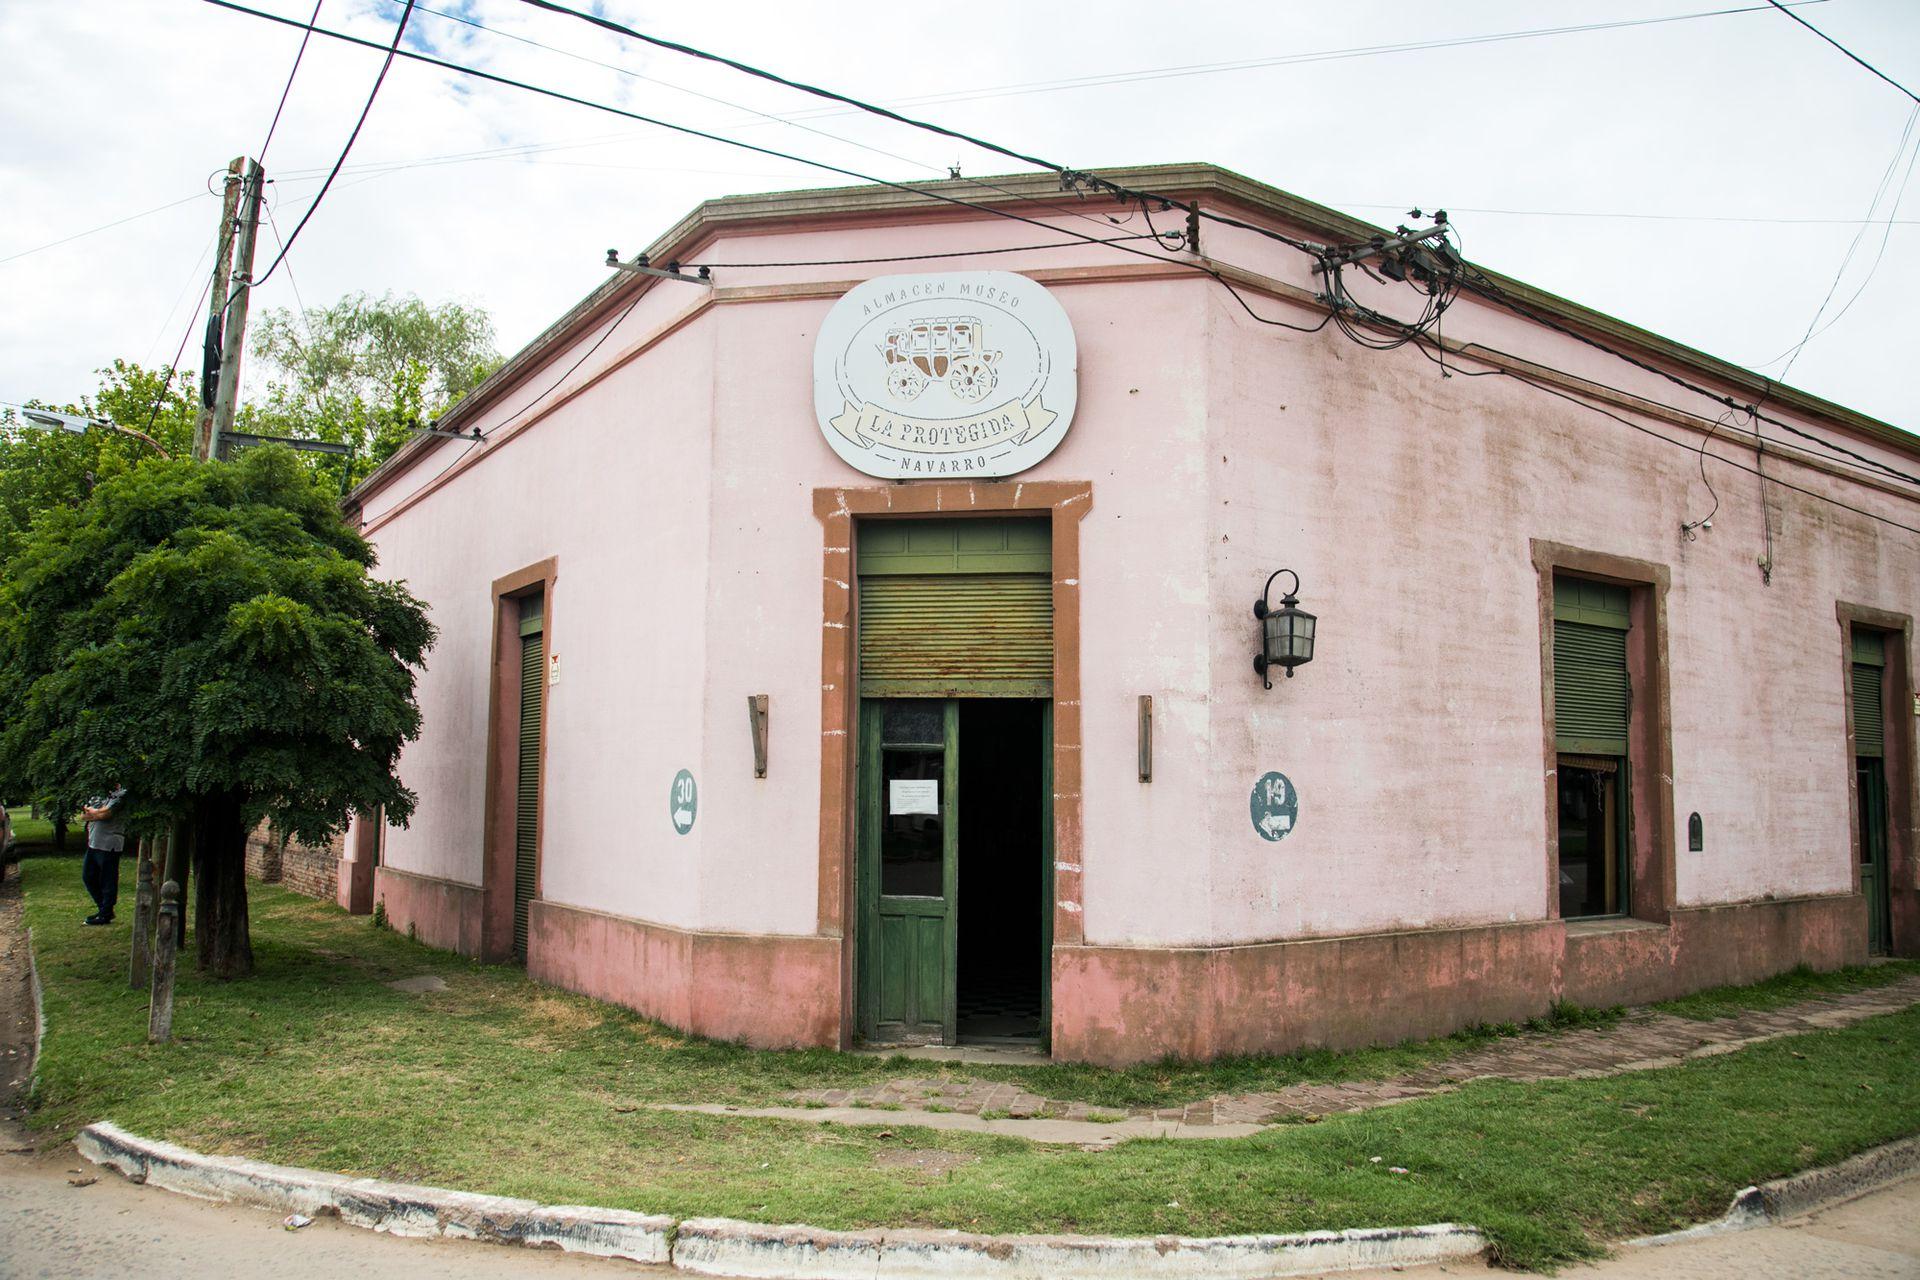 La esquina de La Protegida, en Navarro